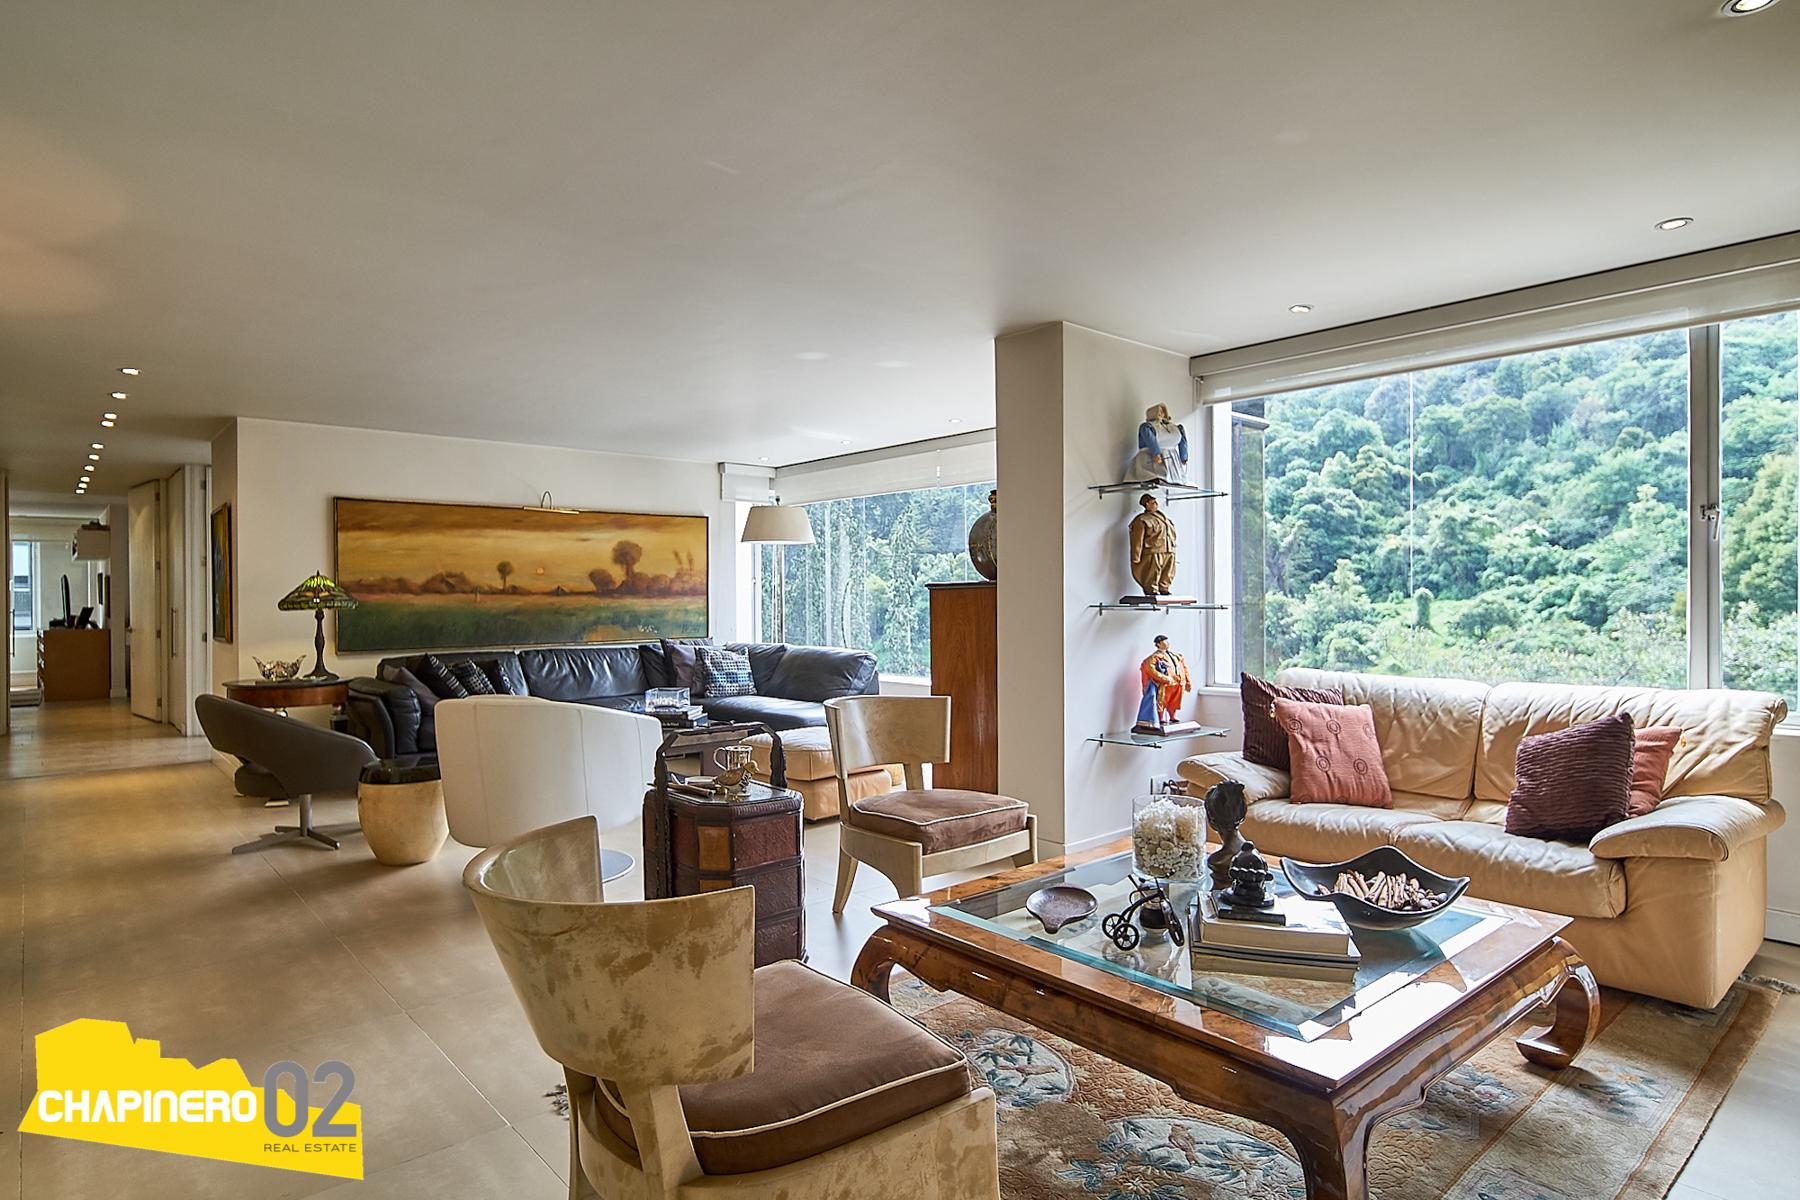 Apto Venta :: 200 m² :: Chicó Reservado :: $1.550M